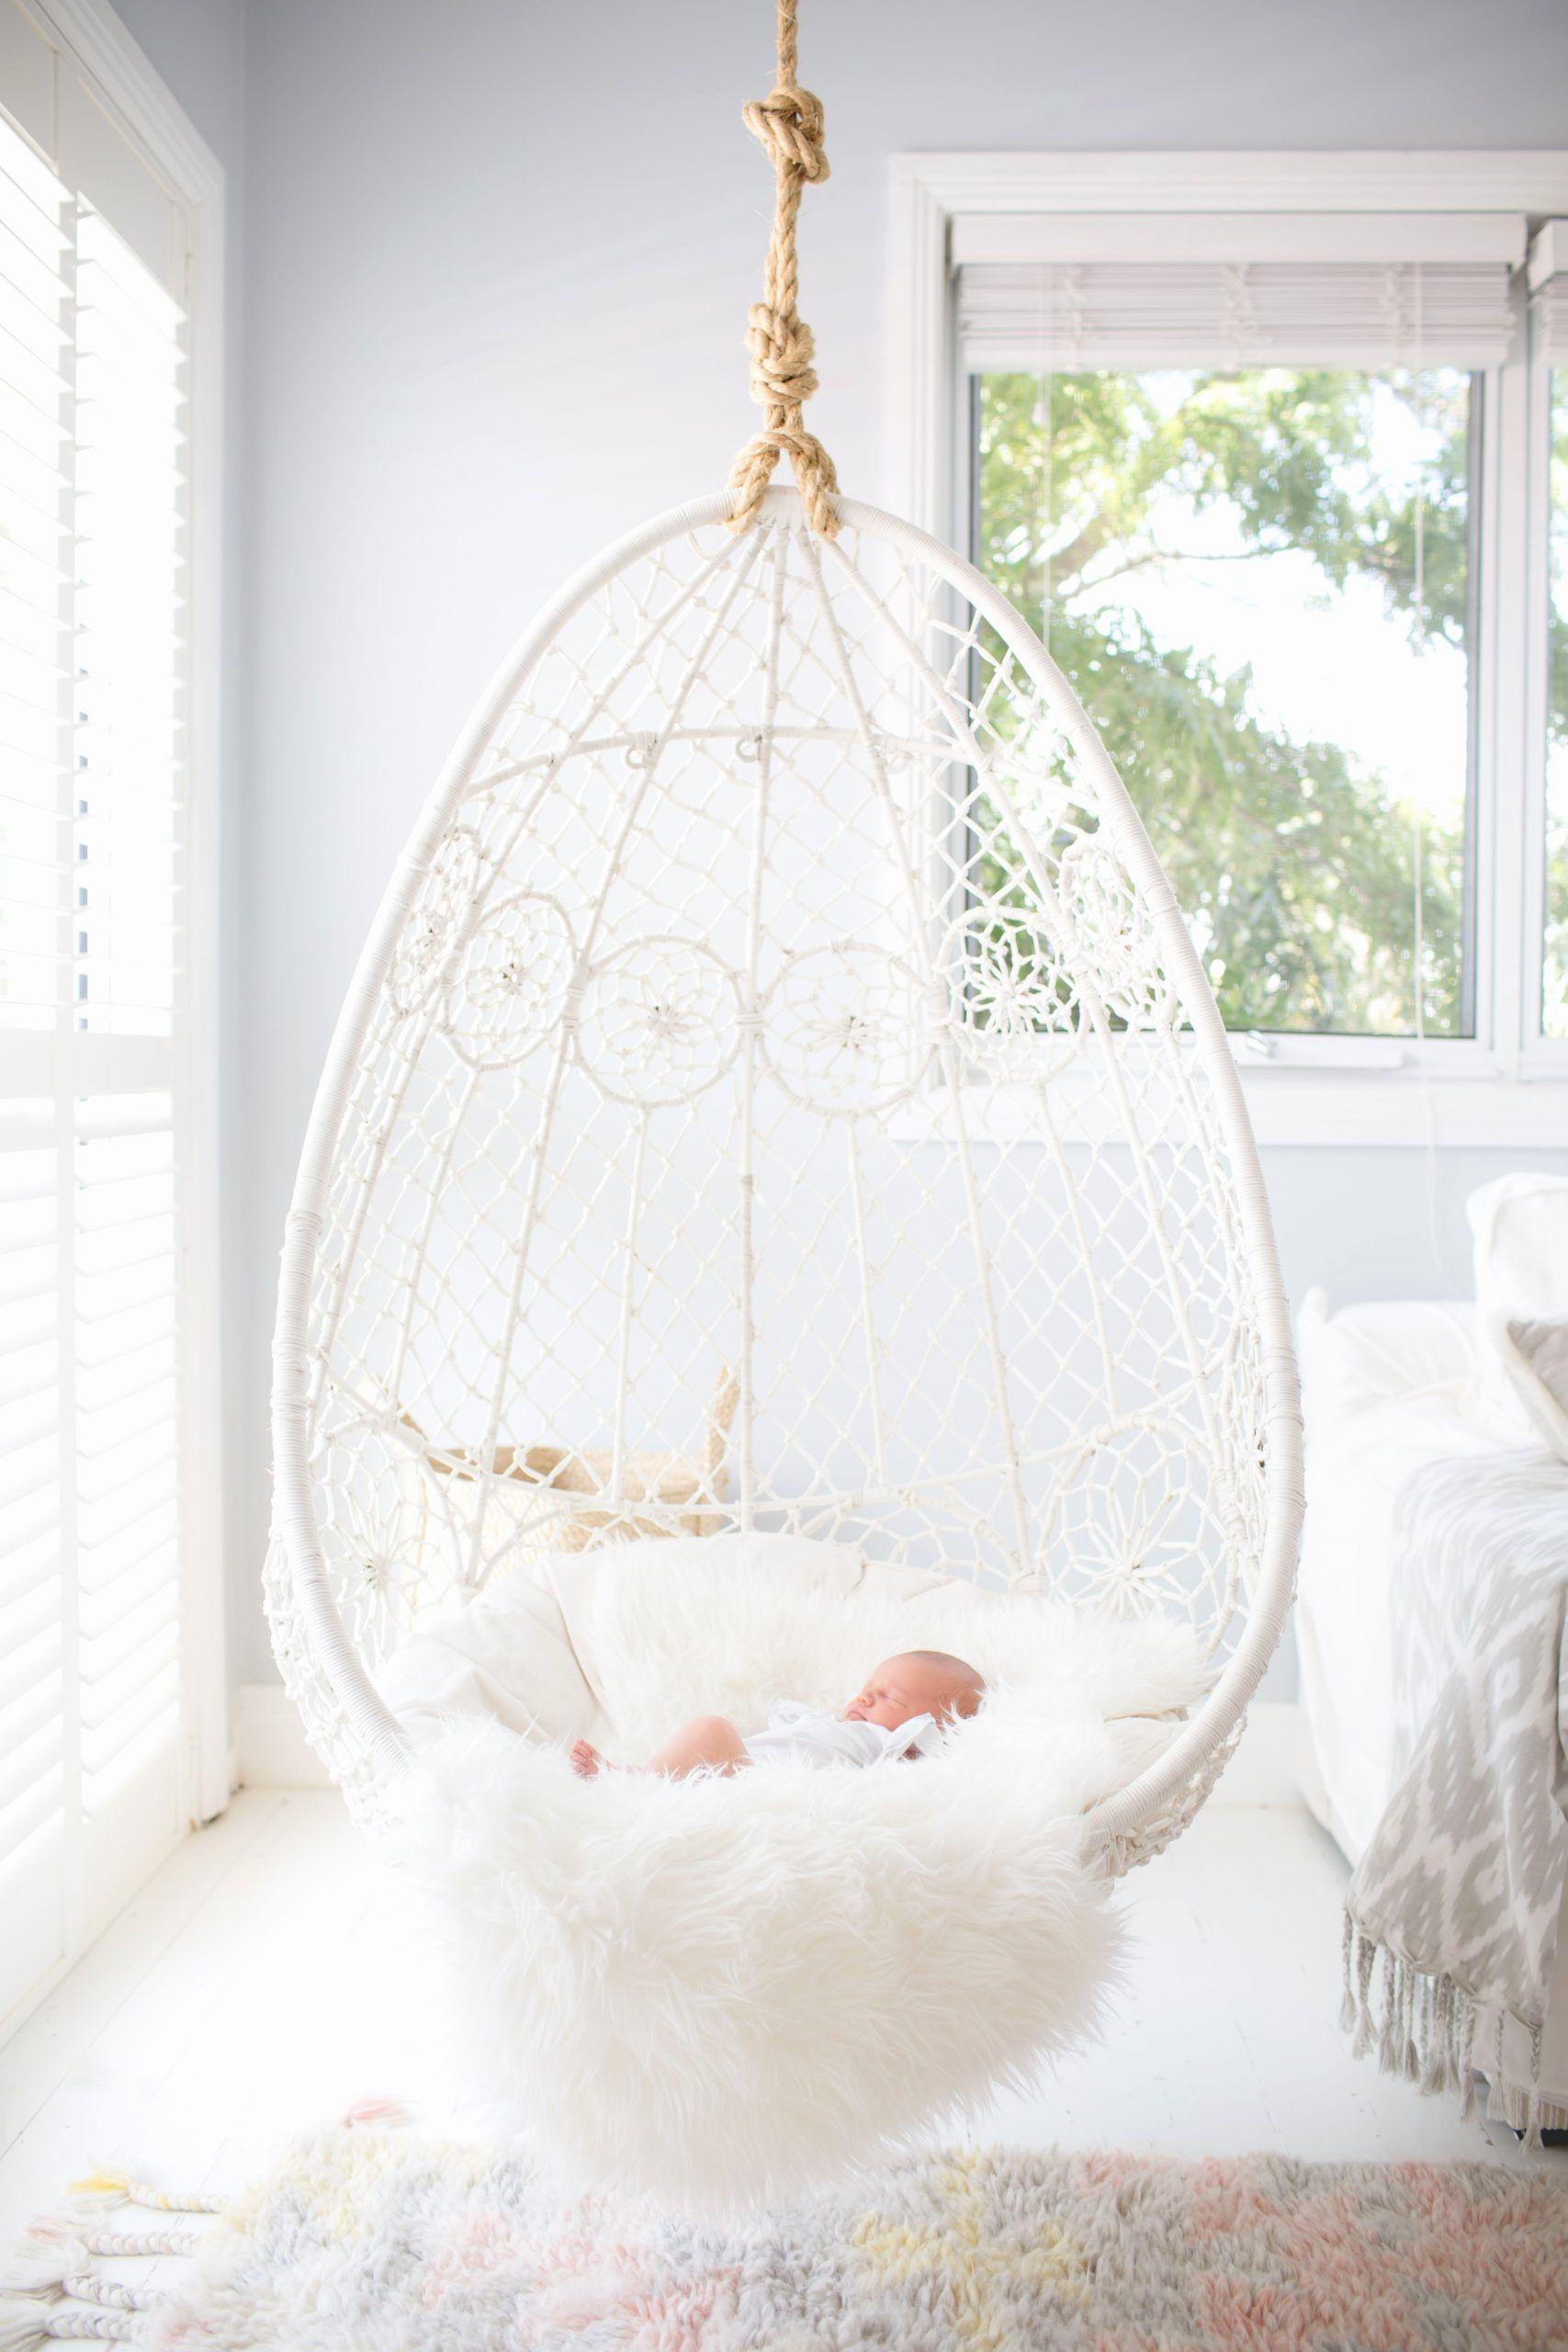 Hanging Chair For Bedroom Elegant Pin On Bedroom Decor In 2020 Swing Chair For Bedroom Swing Chair Bedroom Bedroom Hammock Chair